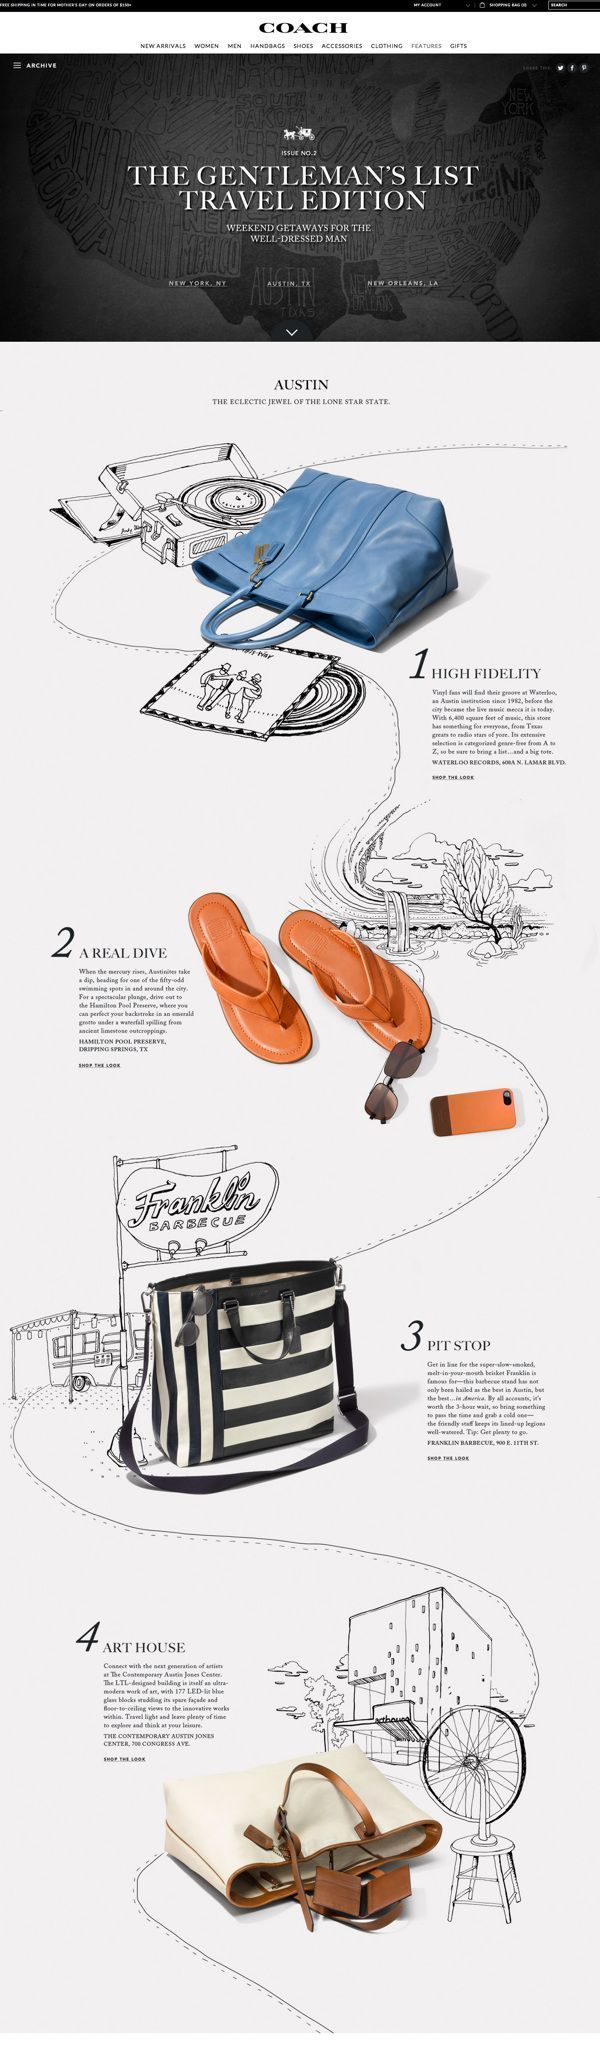 Inspiration | Five Star Branding Agency | Fivestar Design and Website Branding